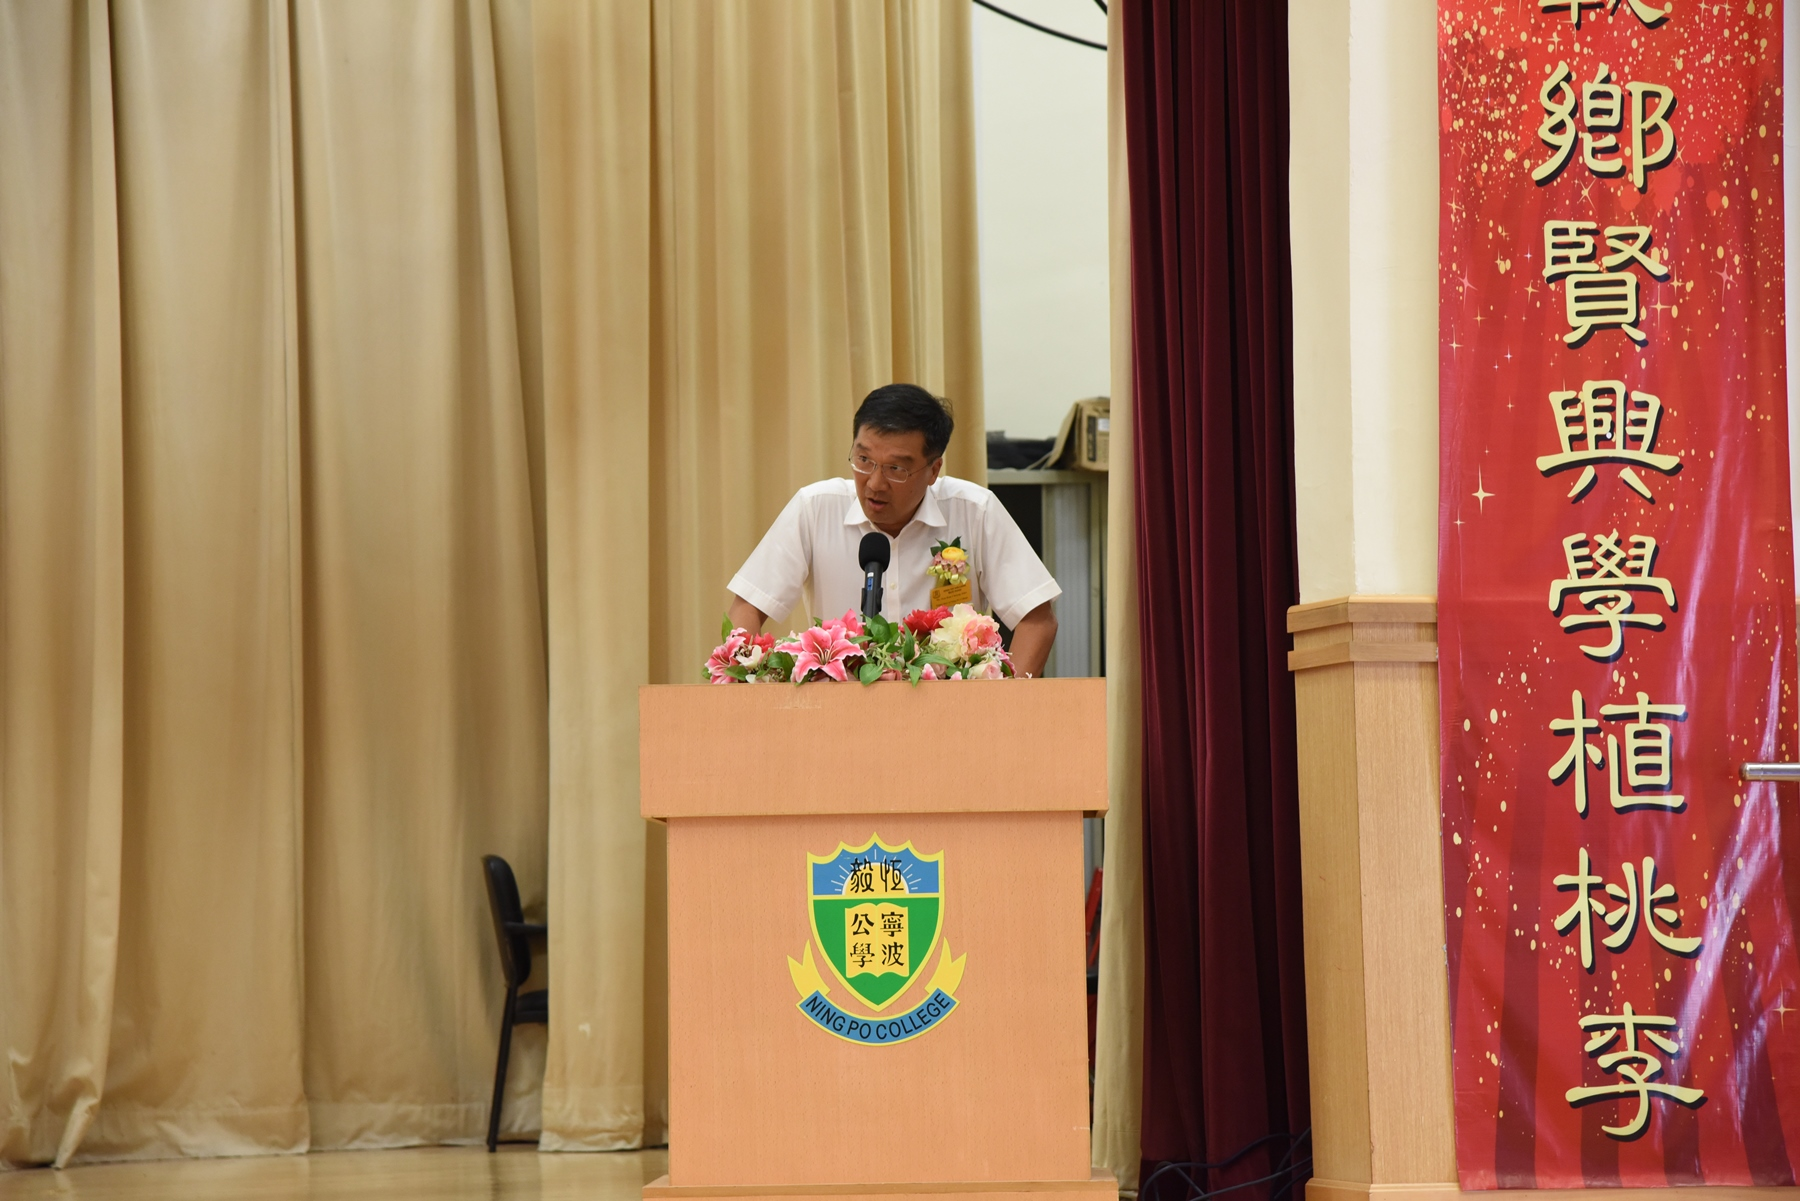 http://www.npc.edu.hk/sites/default/files/dsc_0178.jpg